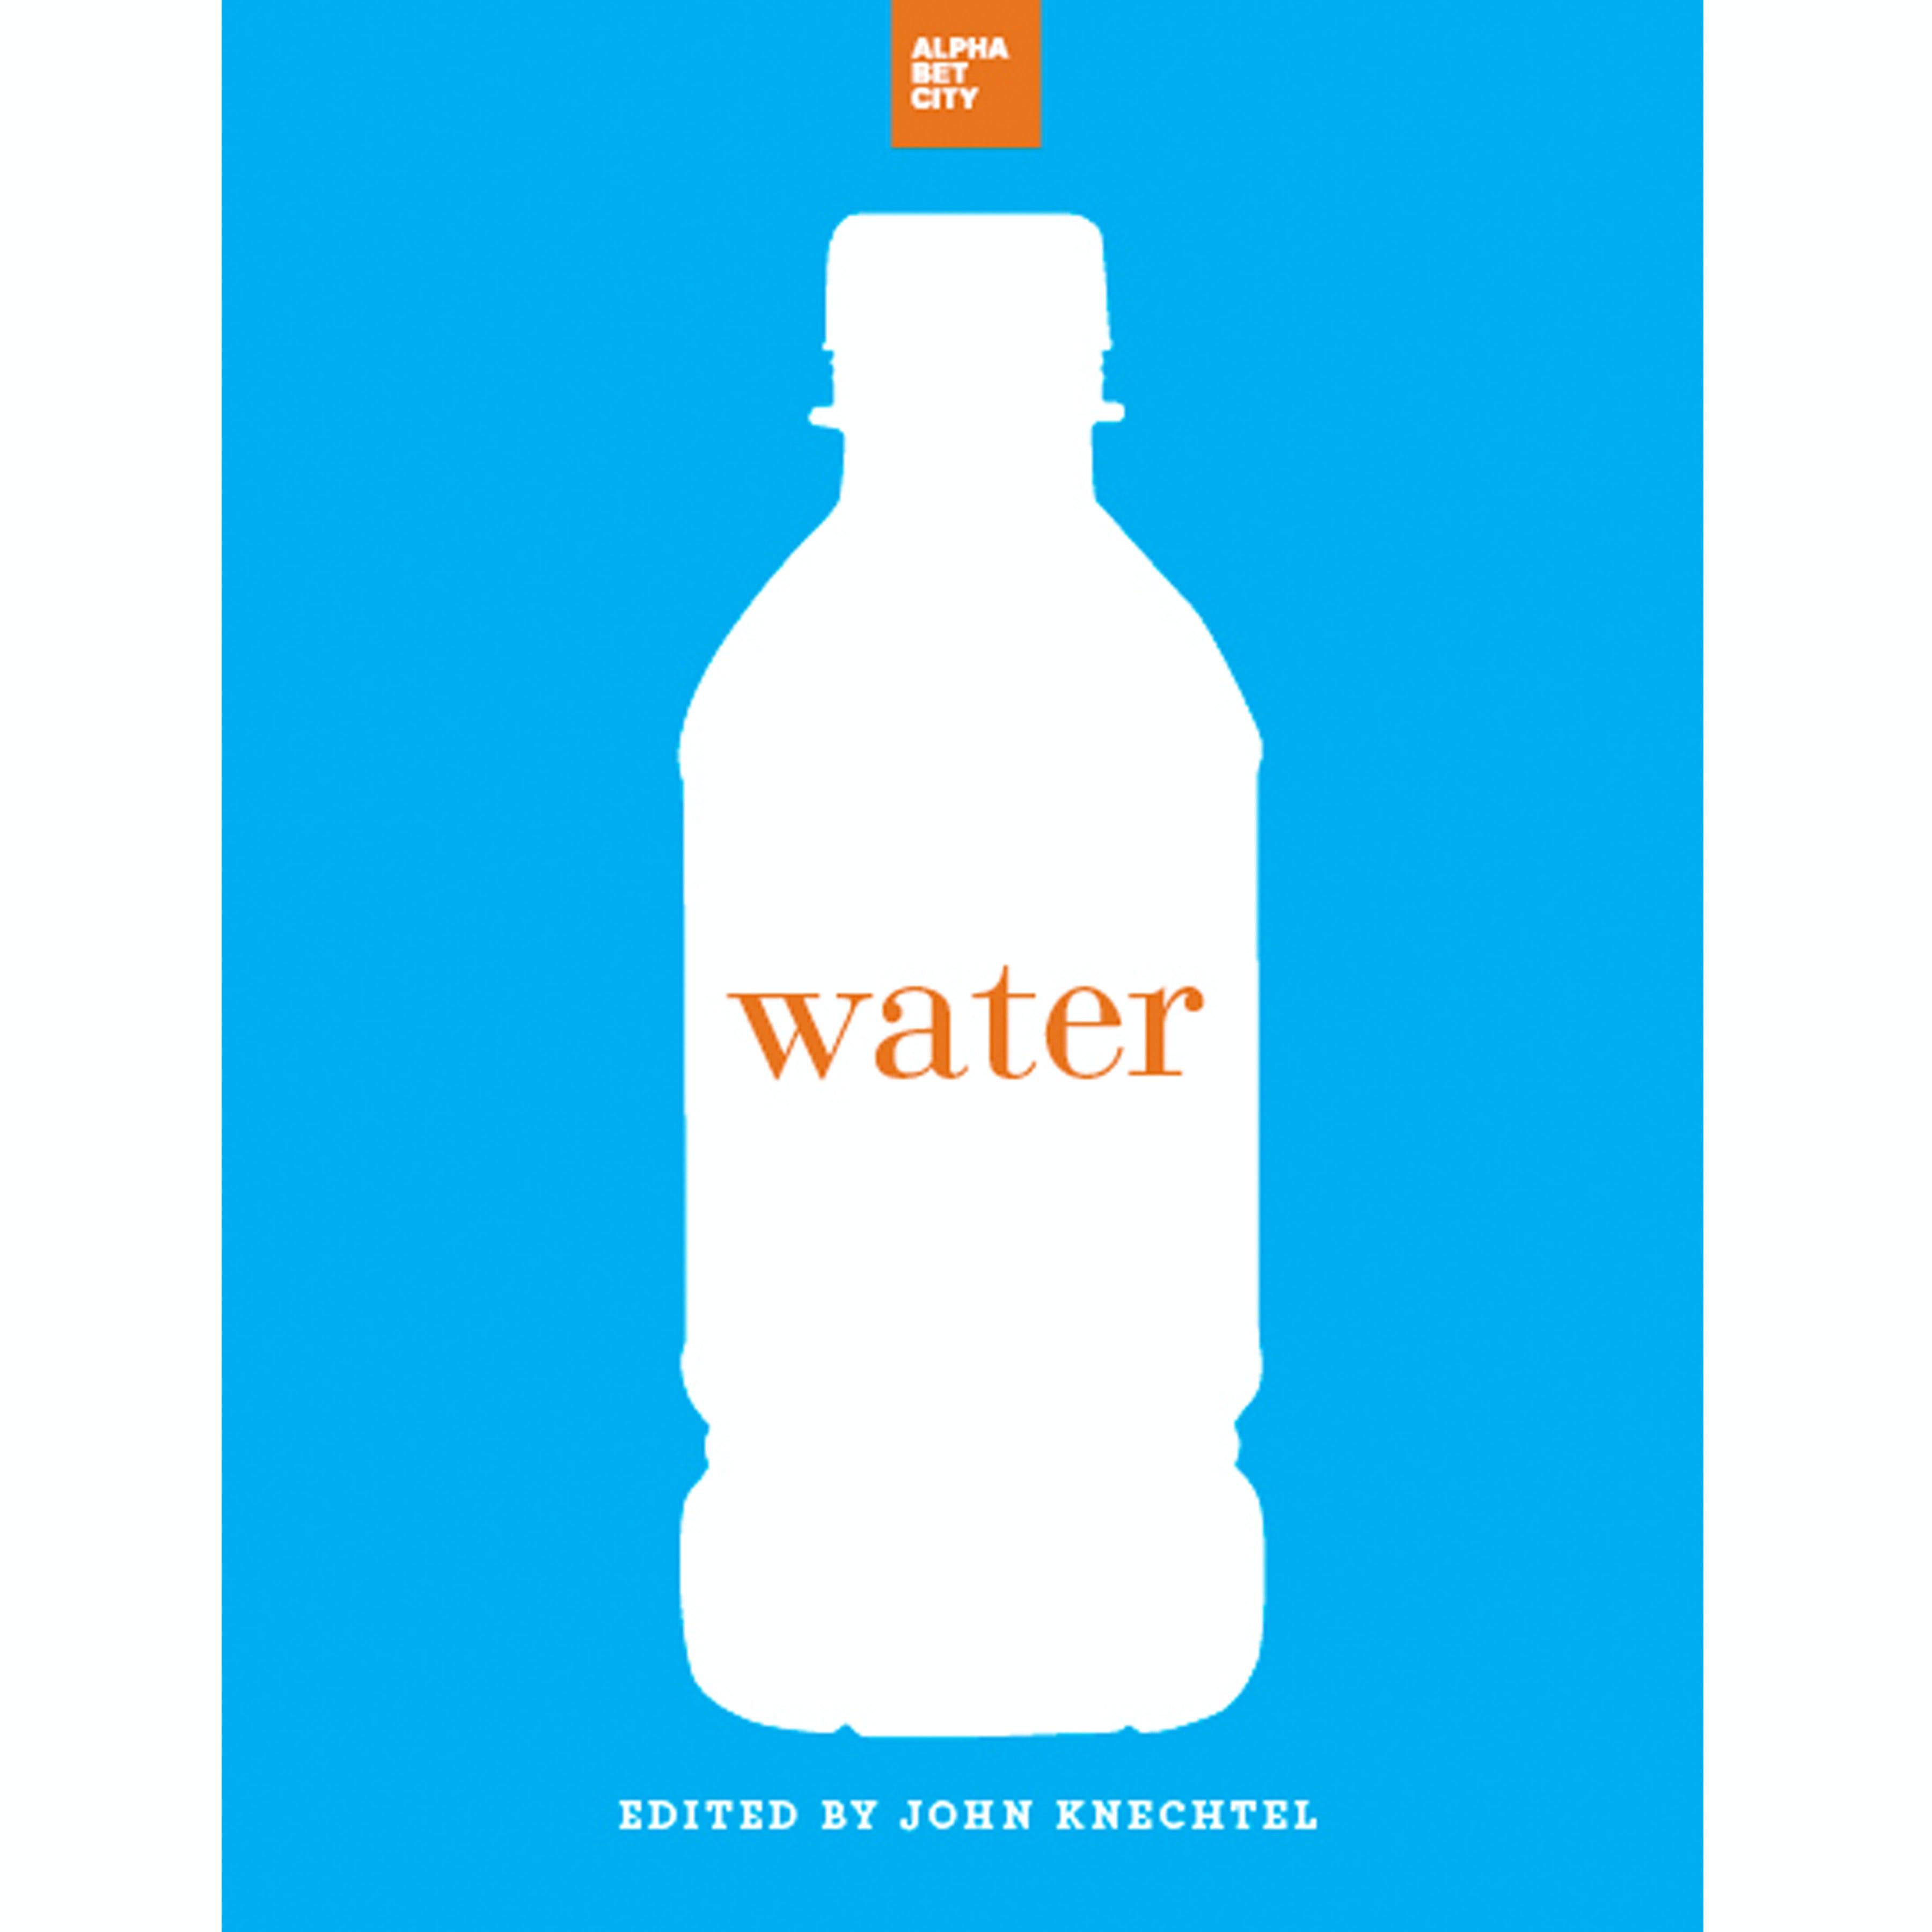 Rvtr water